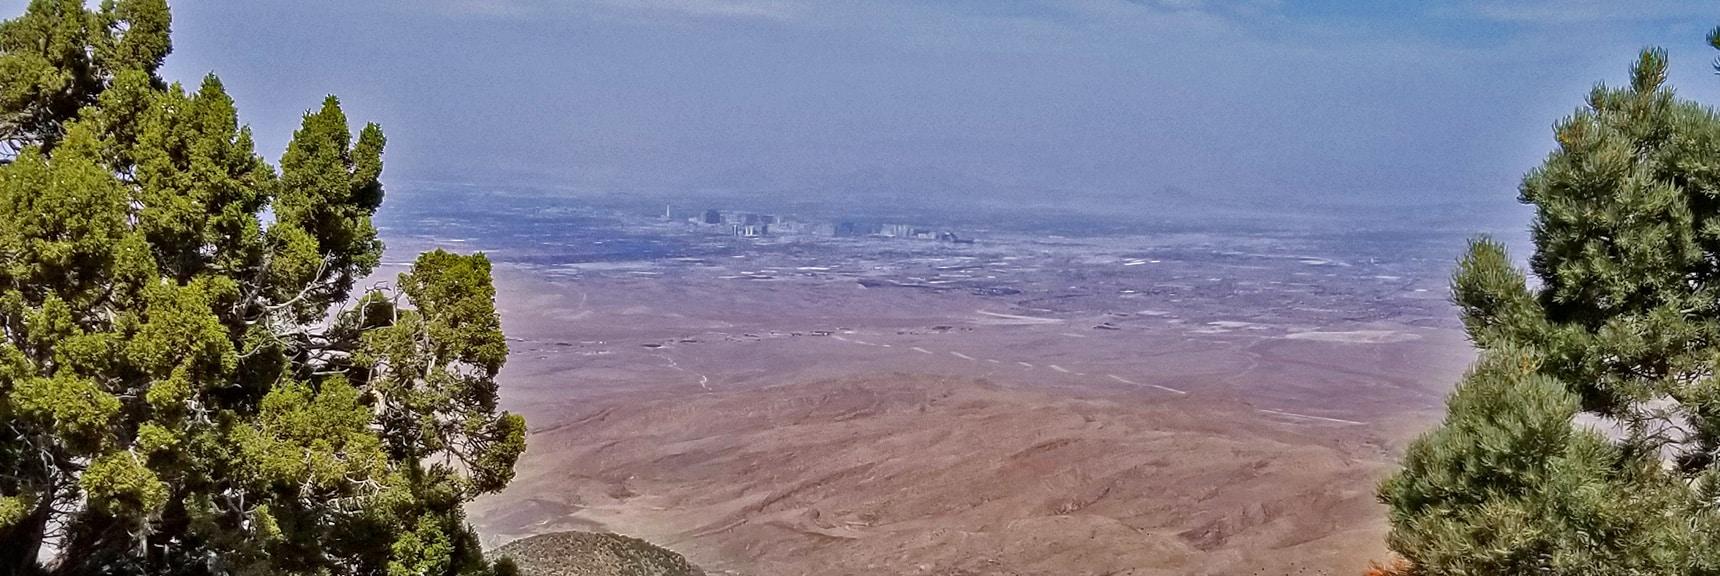 Las Vegas Strip Viewed from Potosi Mountain Road About 1/4th Mile Below the North Summit. | Potosi Mountain Spring Mountains Nevada